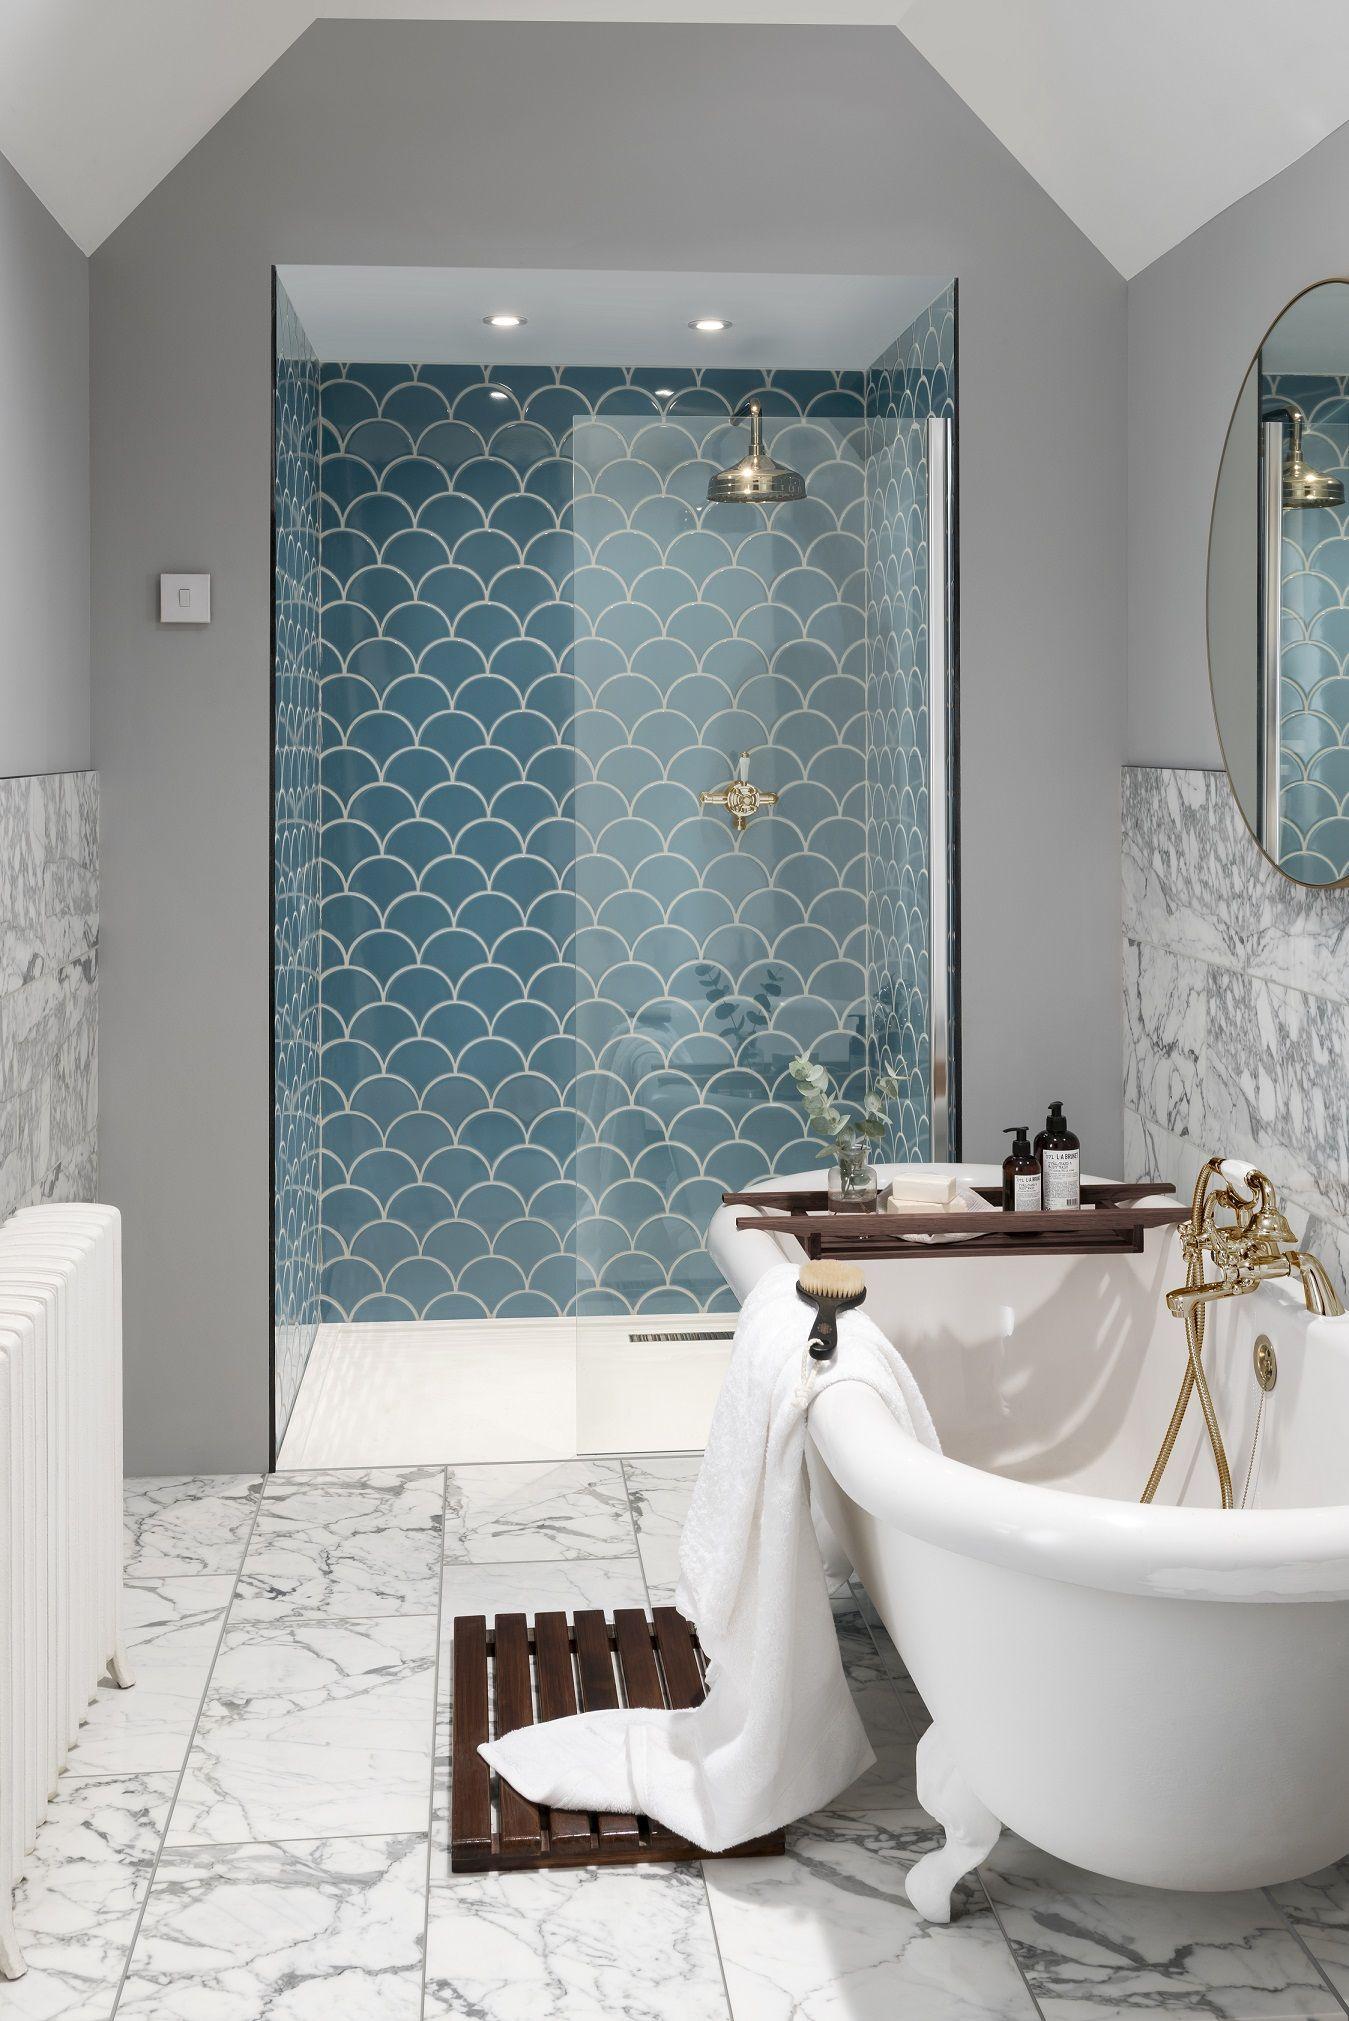 Scallop Tiles Bathroom Go For Beautifully Unique Bathroom Final View By Installing Scallop Patterned T Bathroom Interior Design Unique Bathroom Loft Bathroom